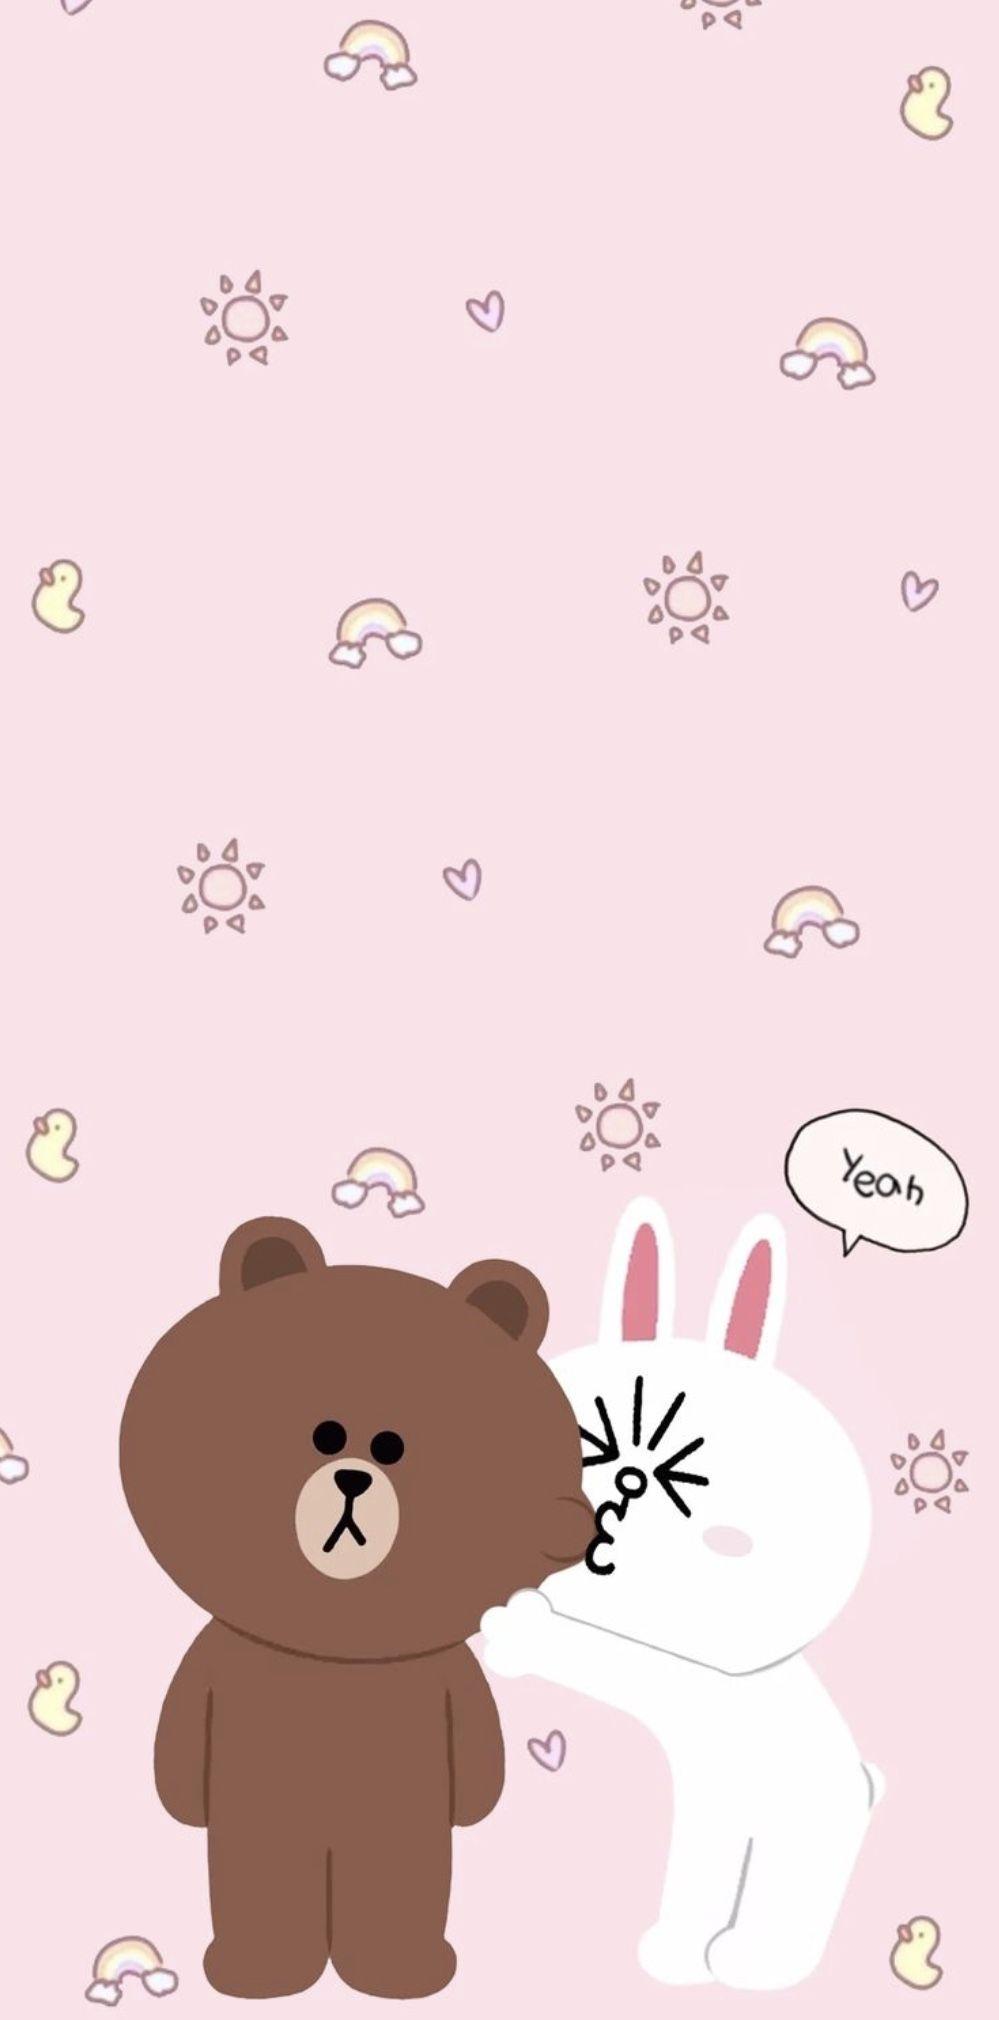 Line Friends Bear Line Friends Bear Korea Korean App Cute Wallpaper Lucu Kartu Lucu Beruang Coklat